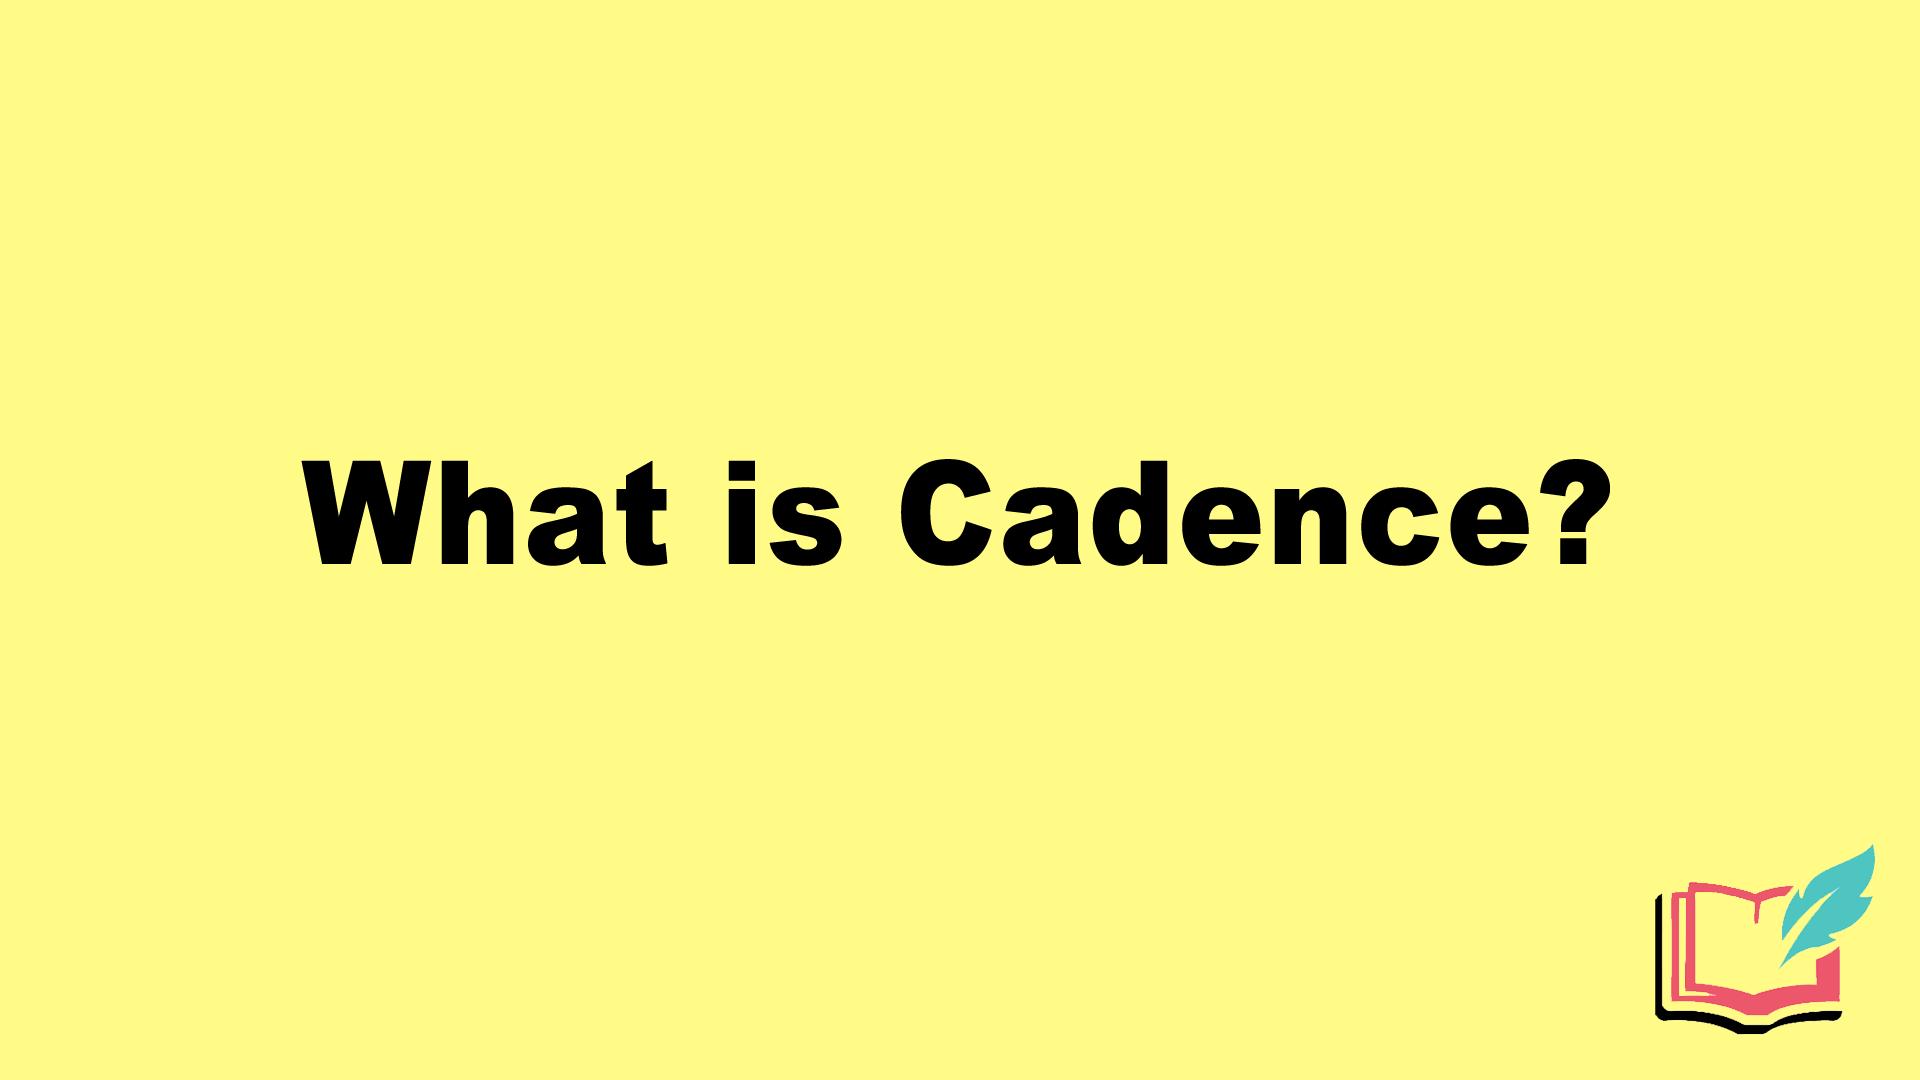 cadence literary device